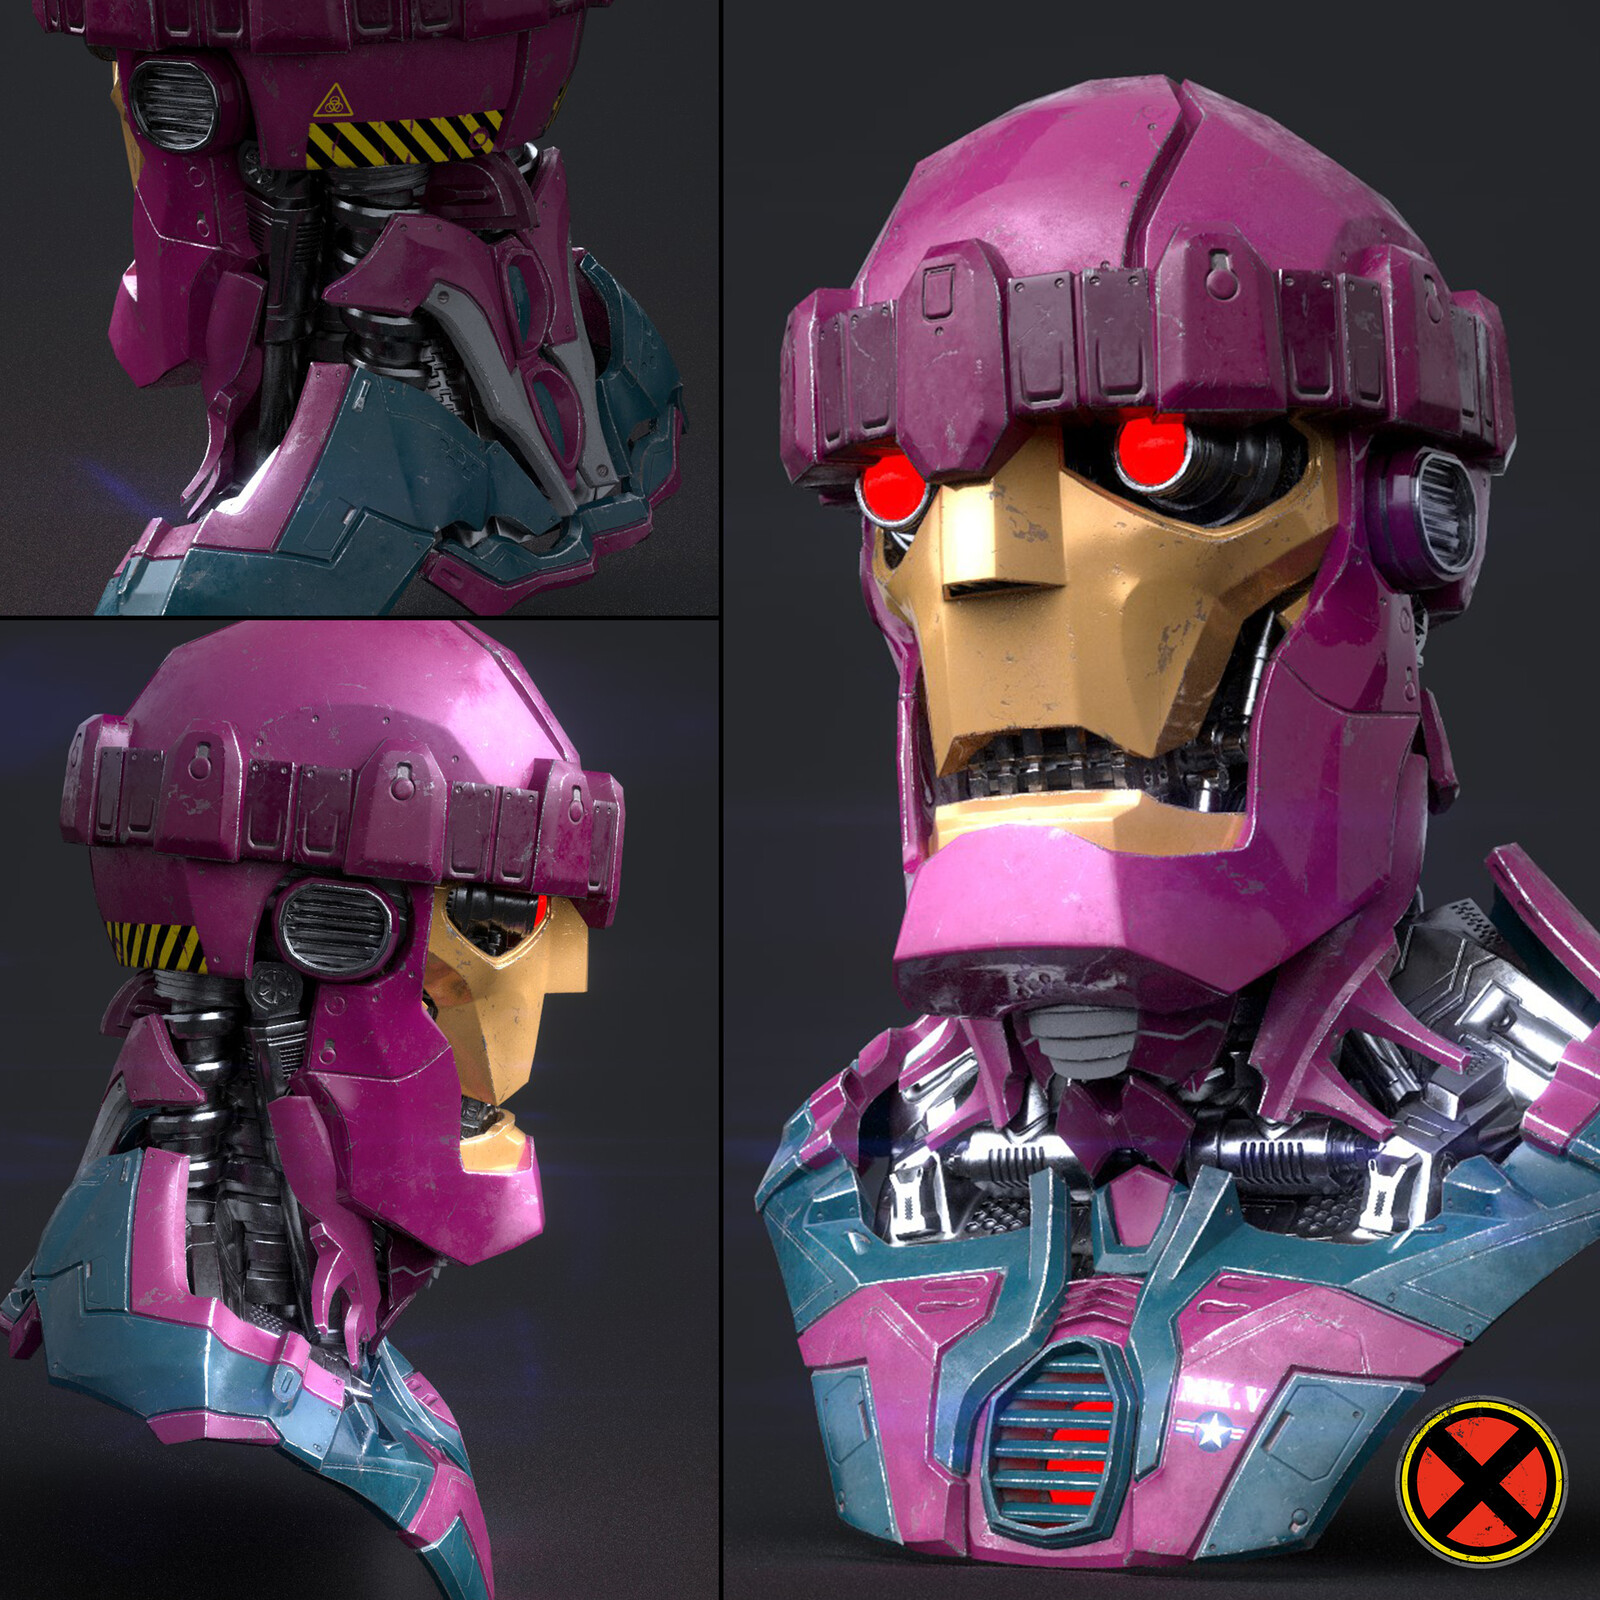 Sentinel Videogames hard-edge sculpture